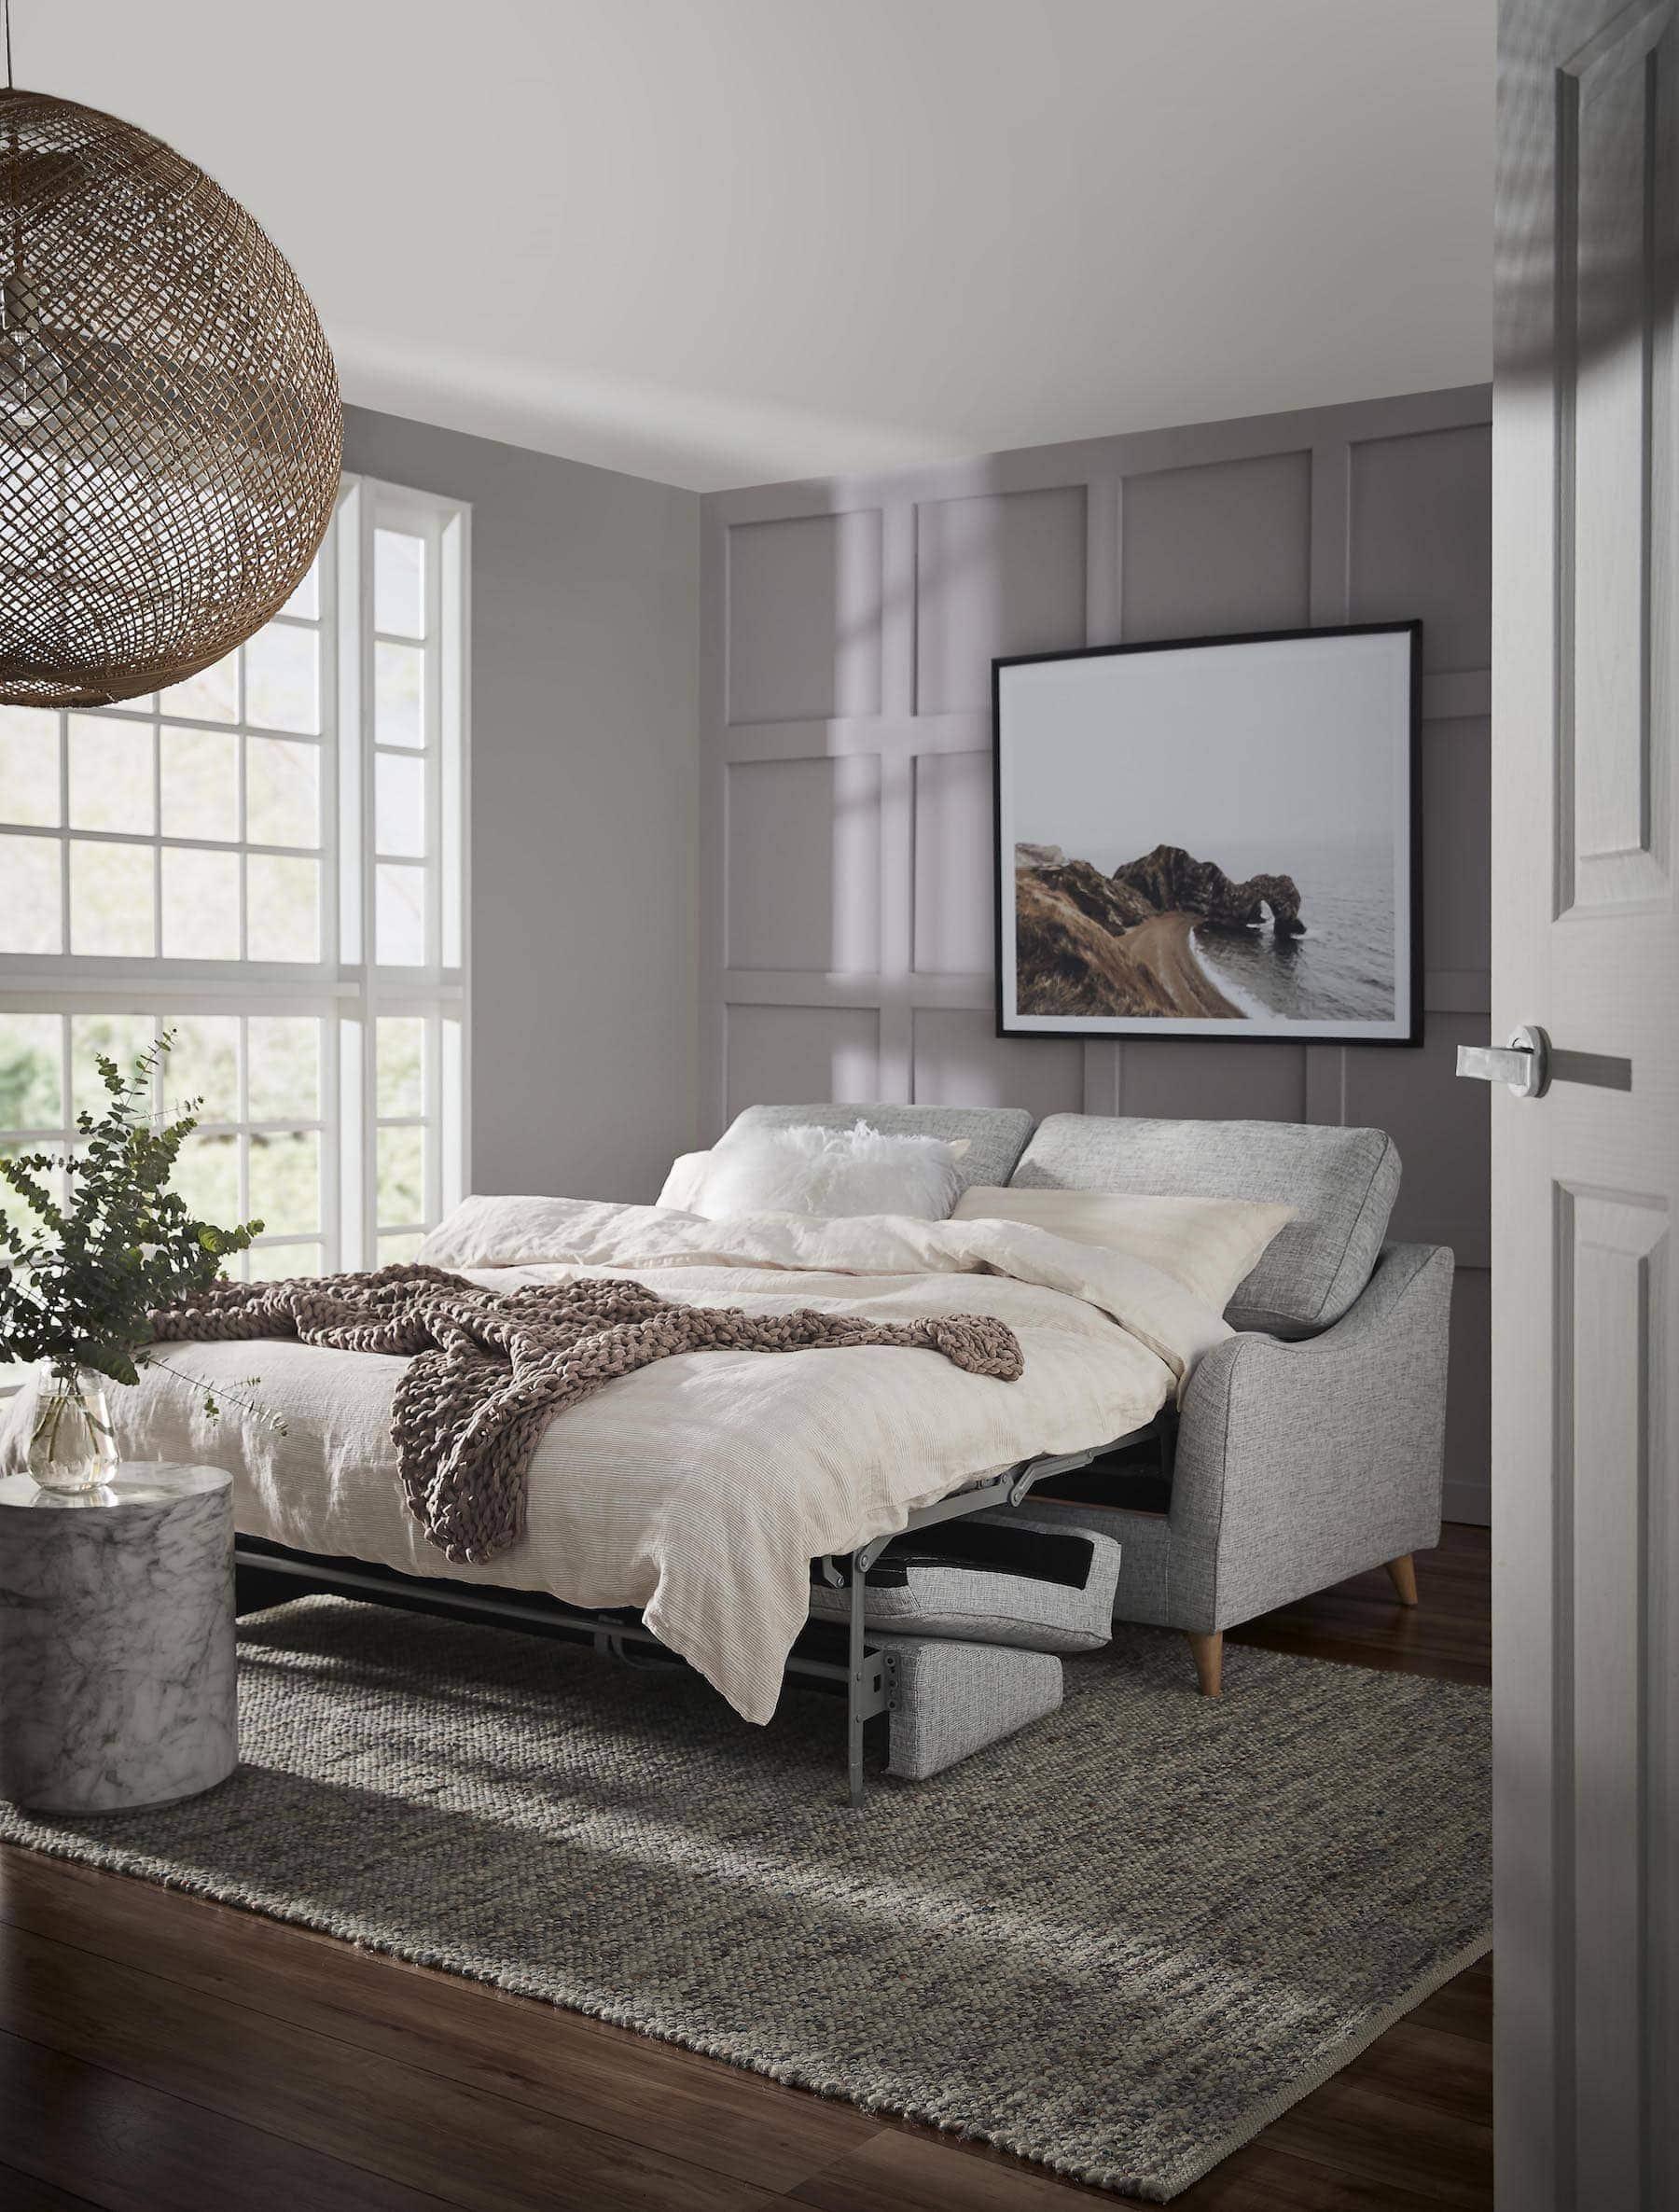 freedom maddox sofa bed review light grey mid century sofa bed